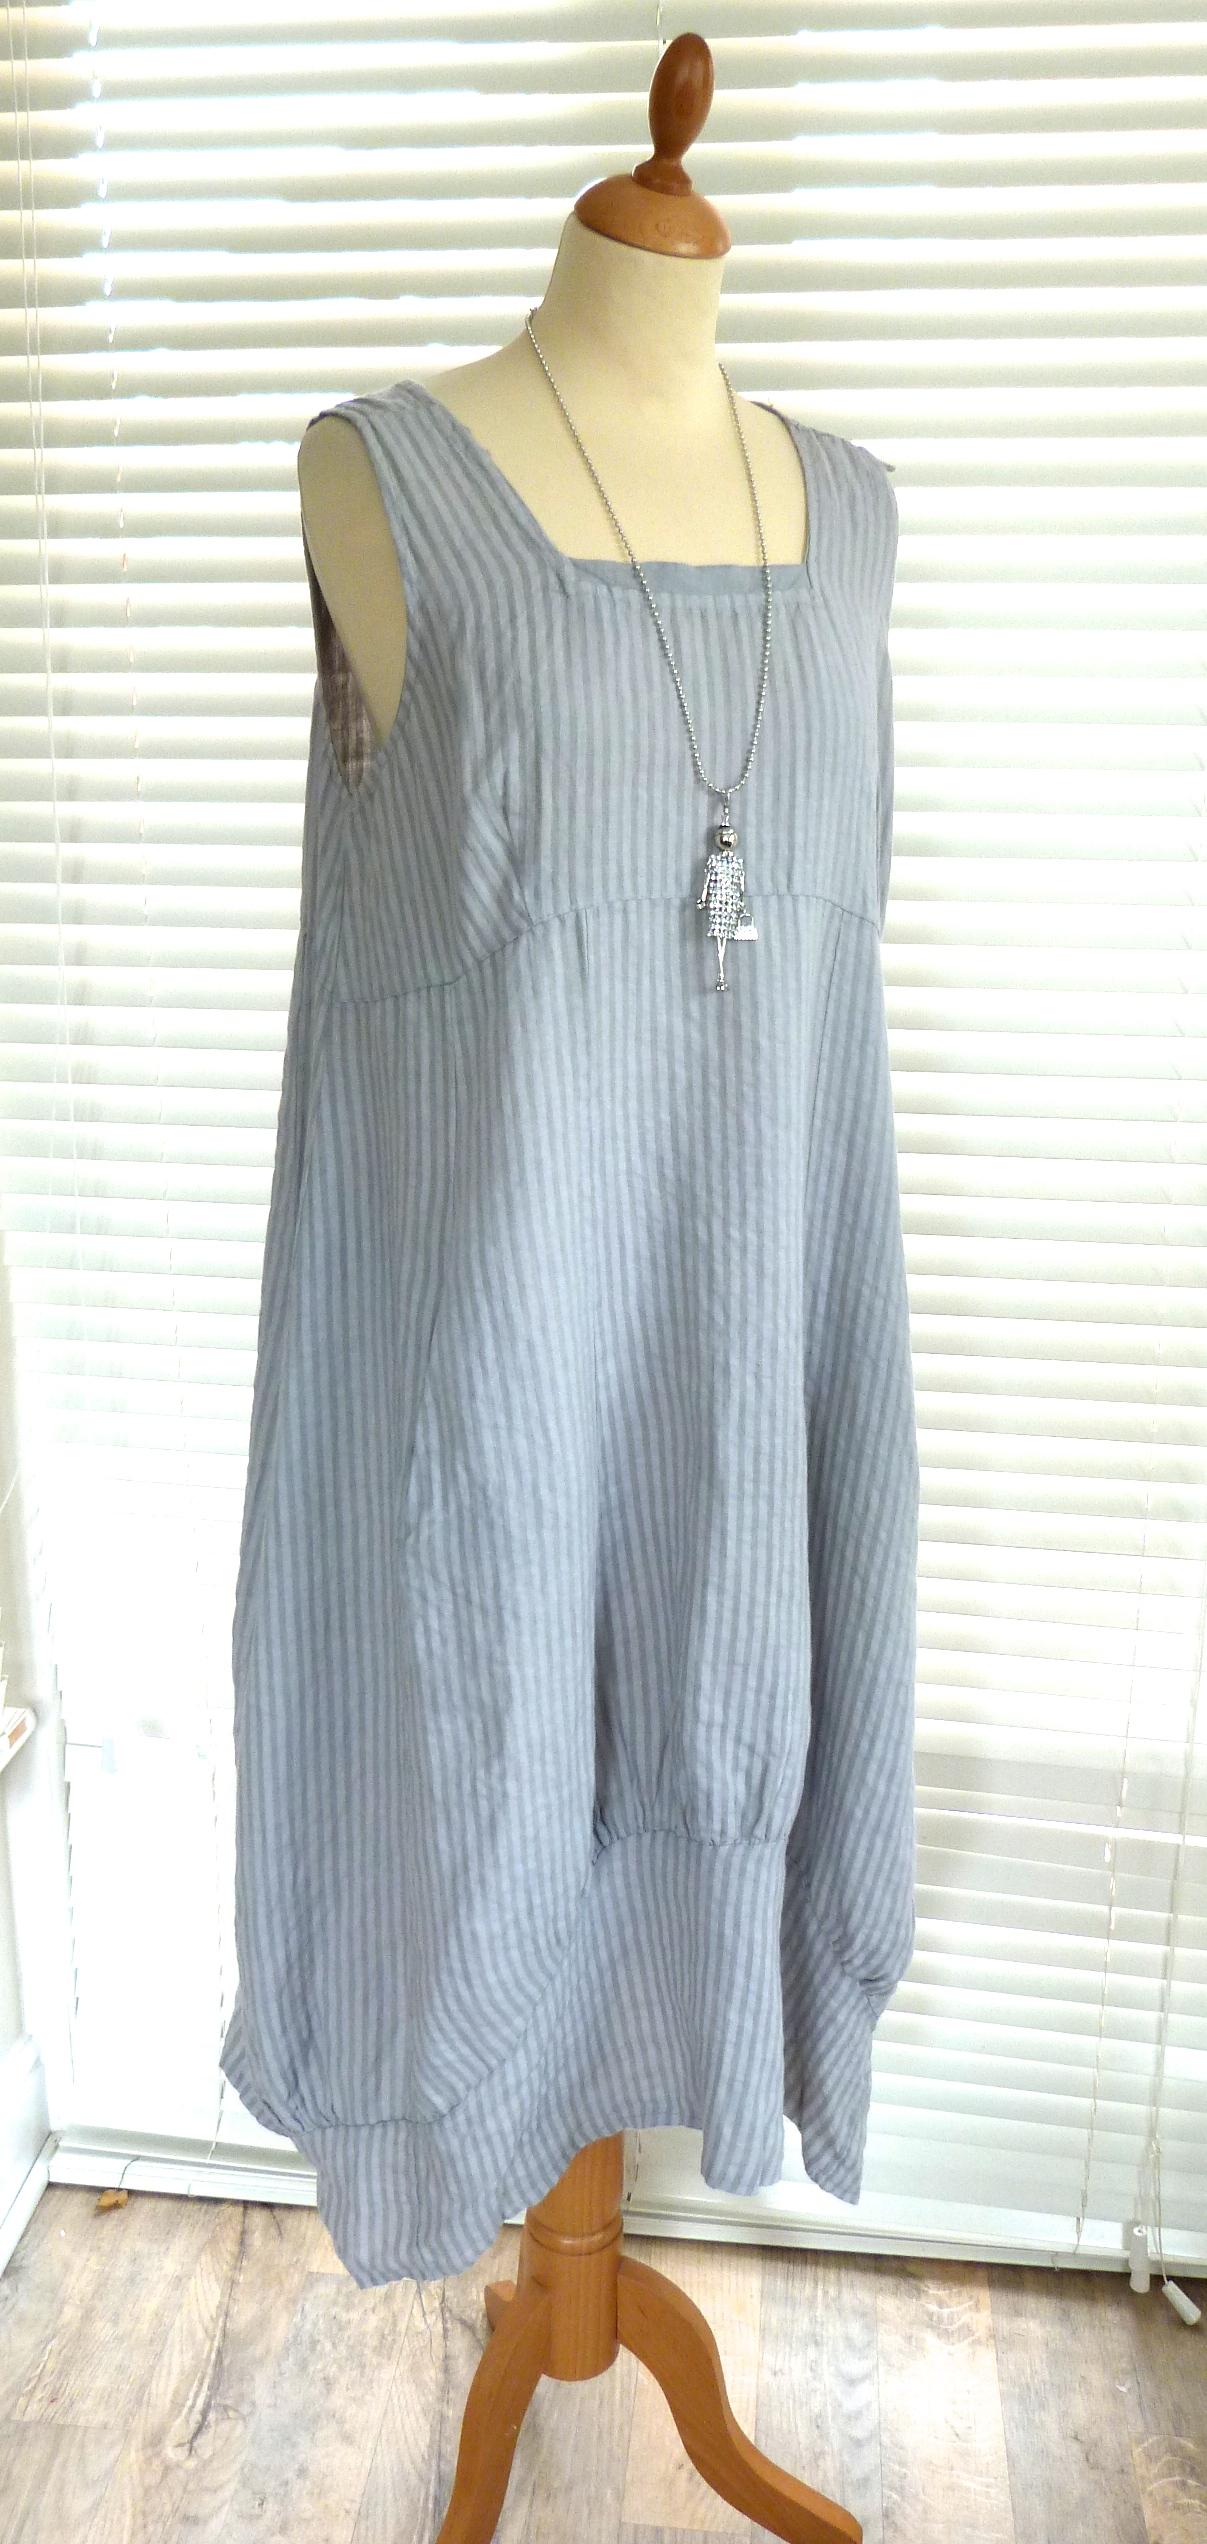 Fab Italian Linen Longer Length Dress With Stripes